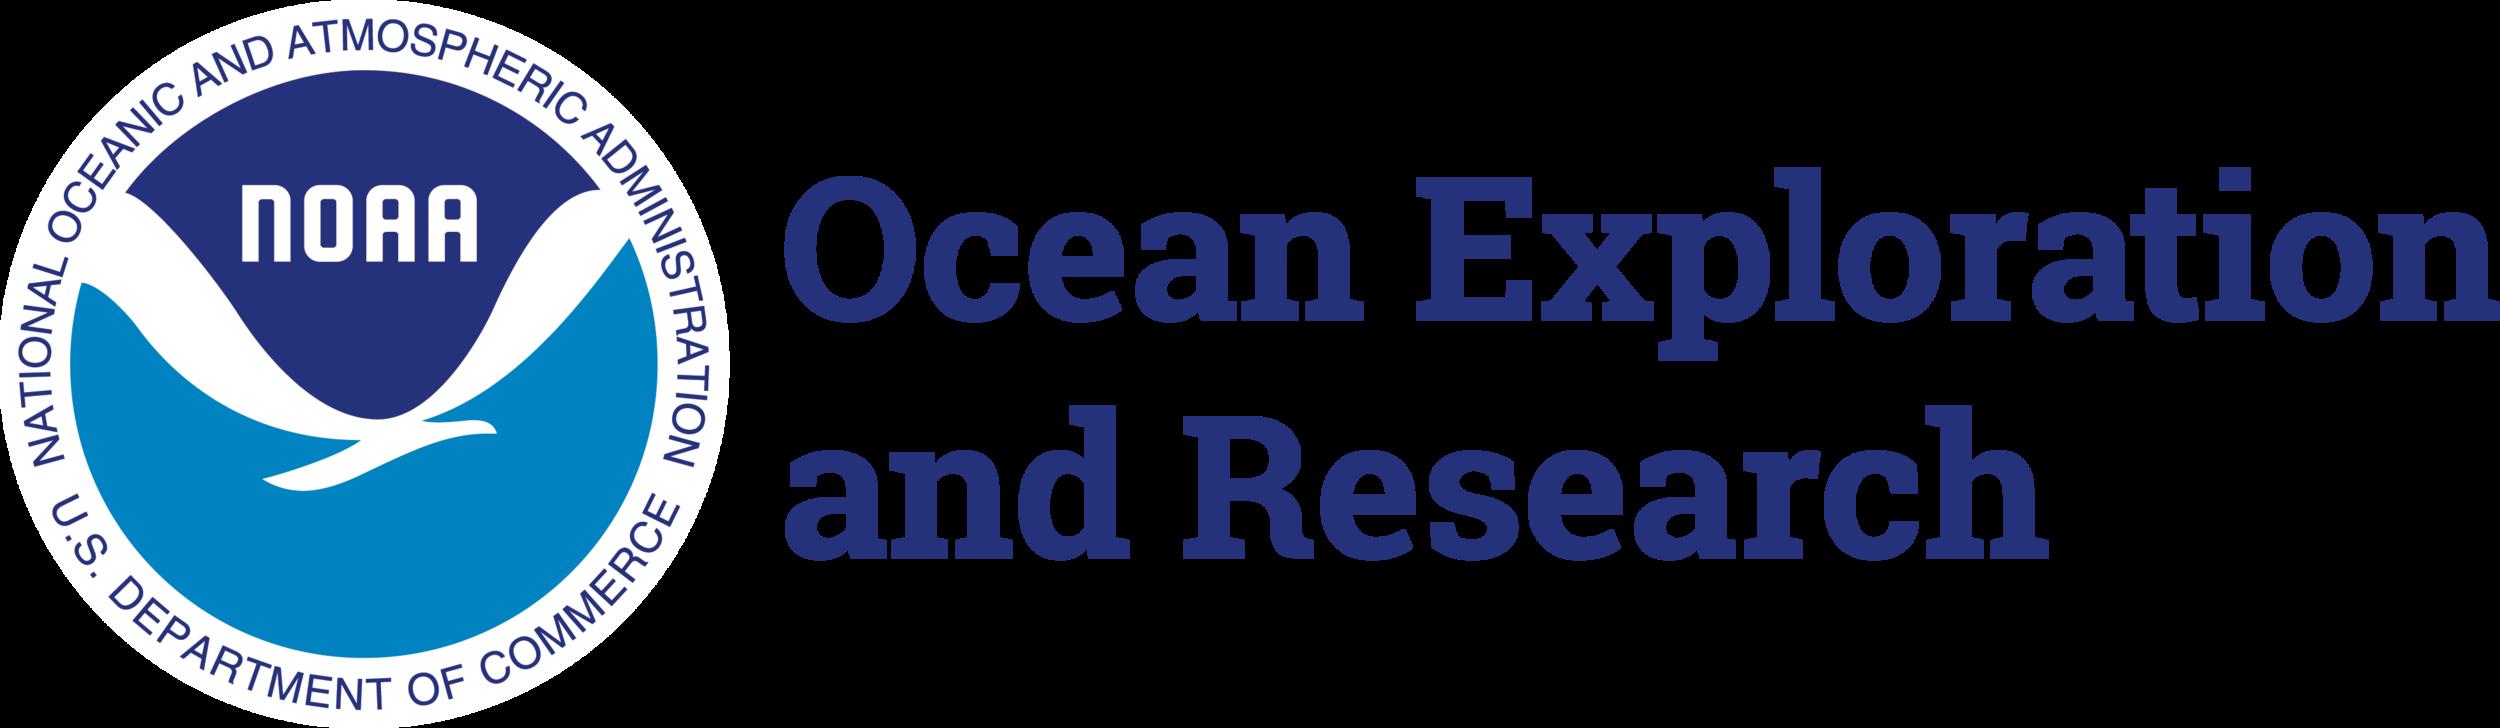 NOAA Office of Ocean Exploration & Research